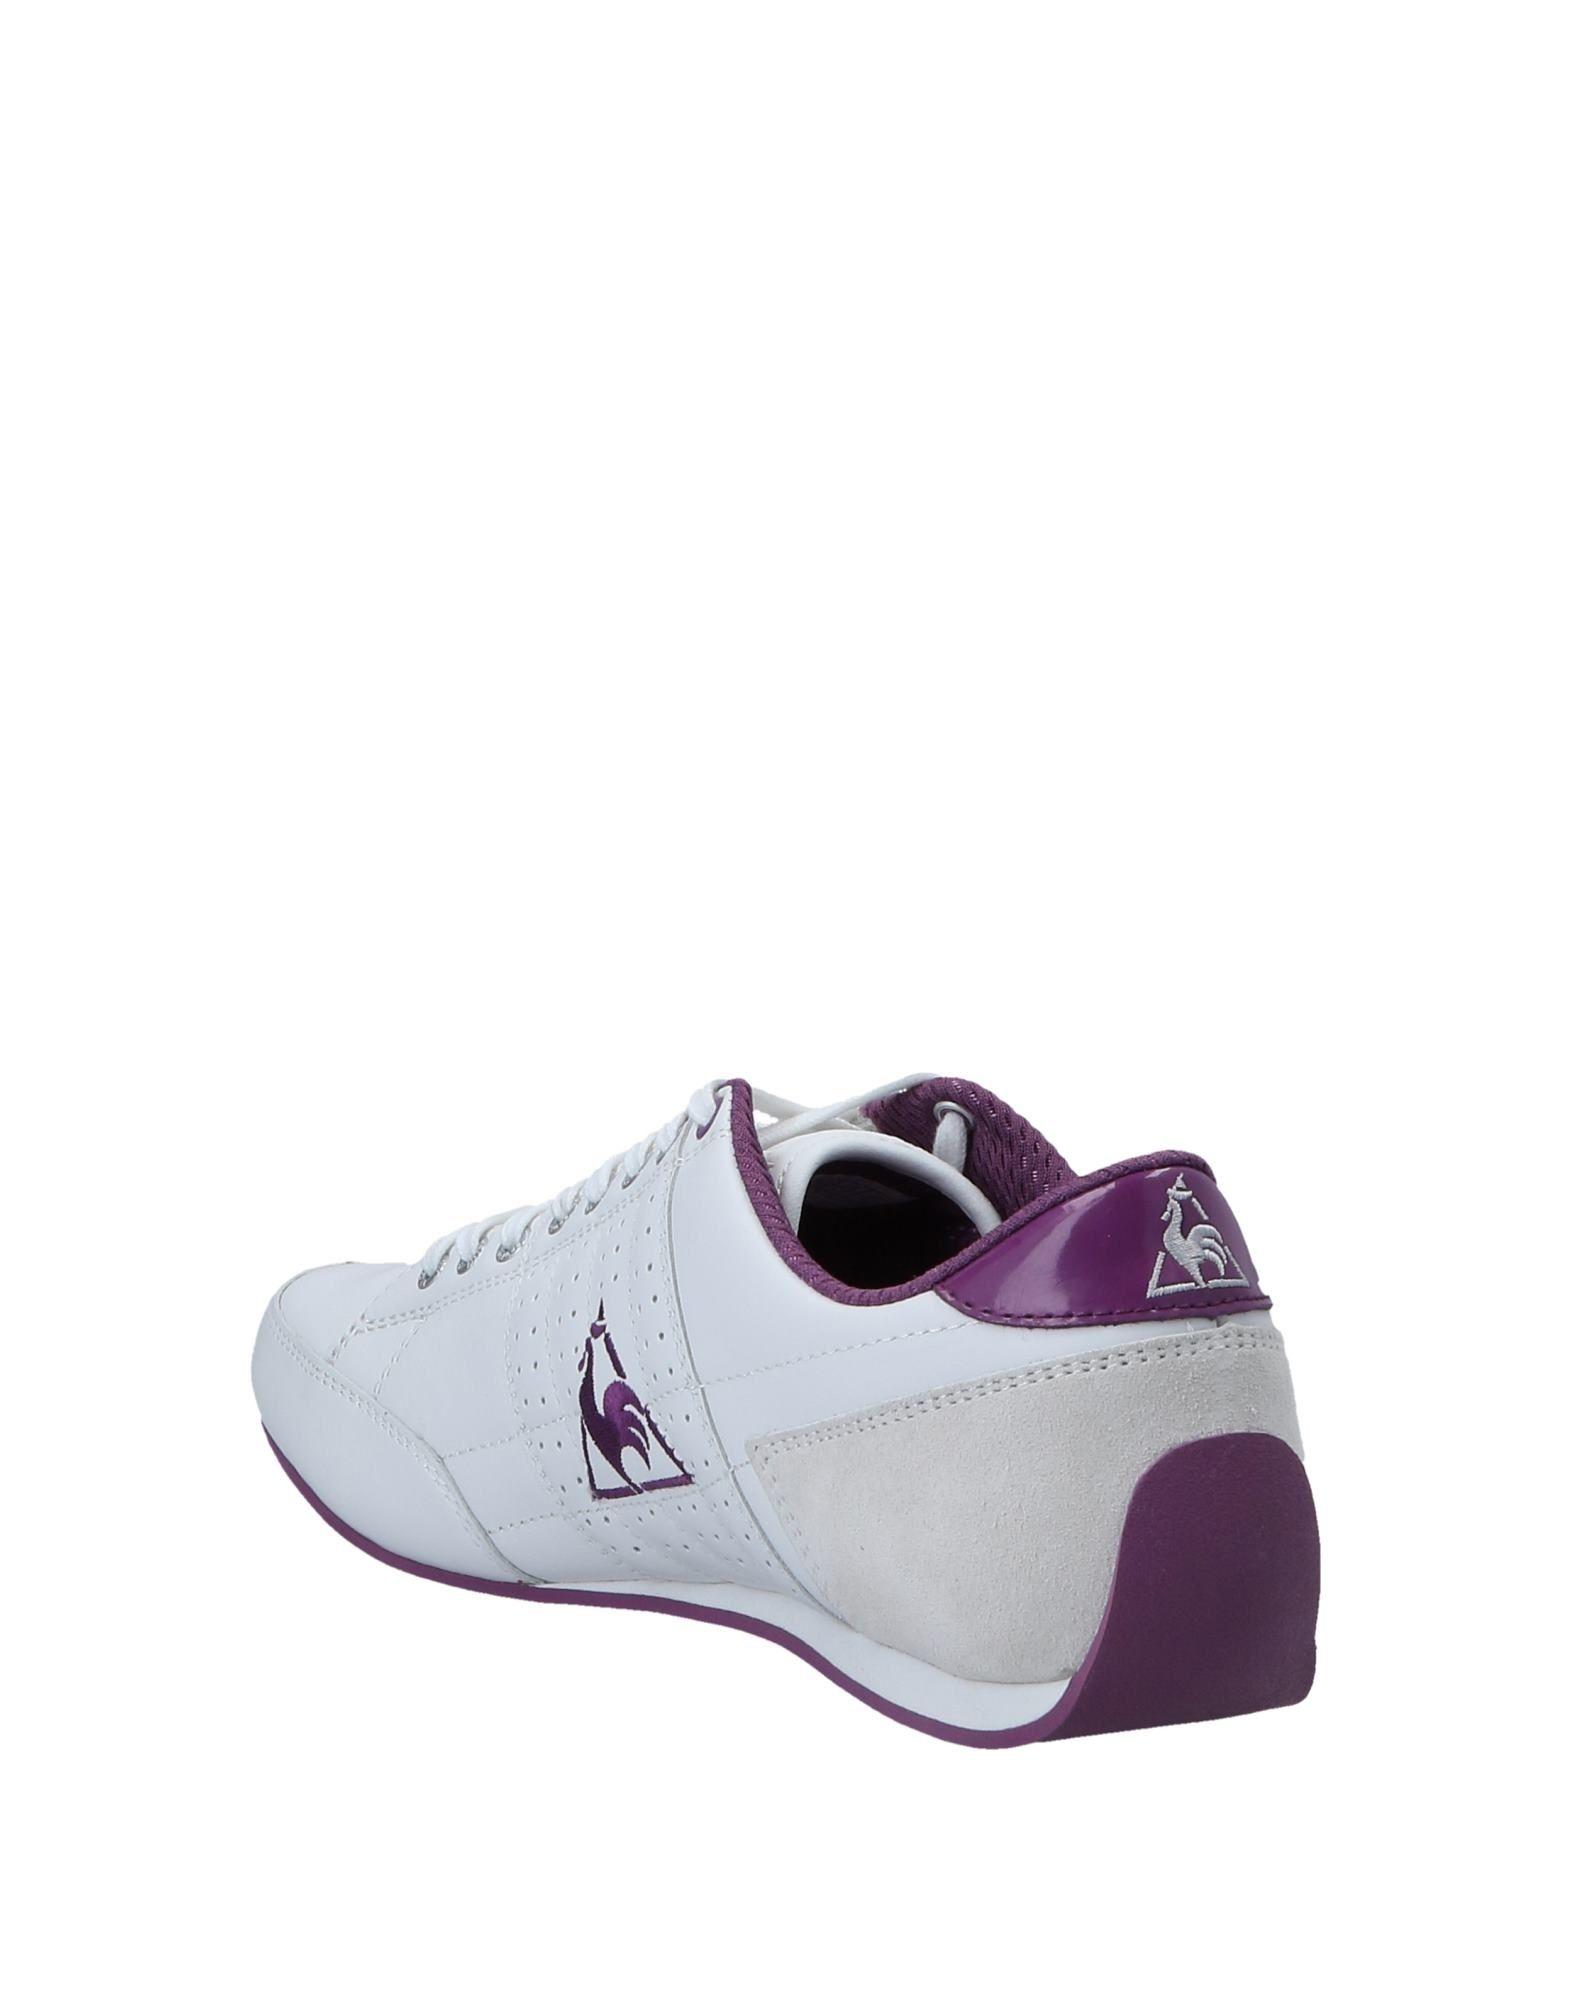 Le Coq Sportif Sneakers beliebte Damen  11549751FW Gute Qualität beliebte Sneakers Schuhe 5a5cba